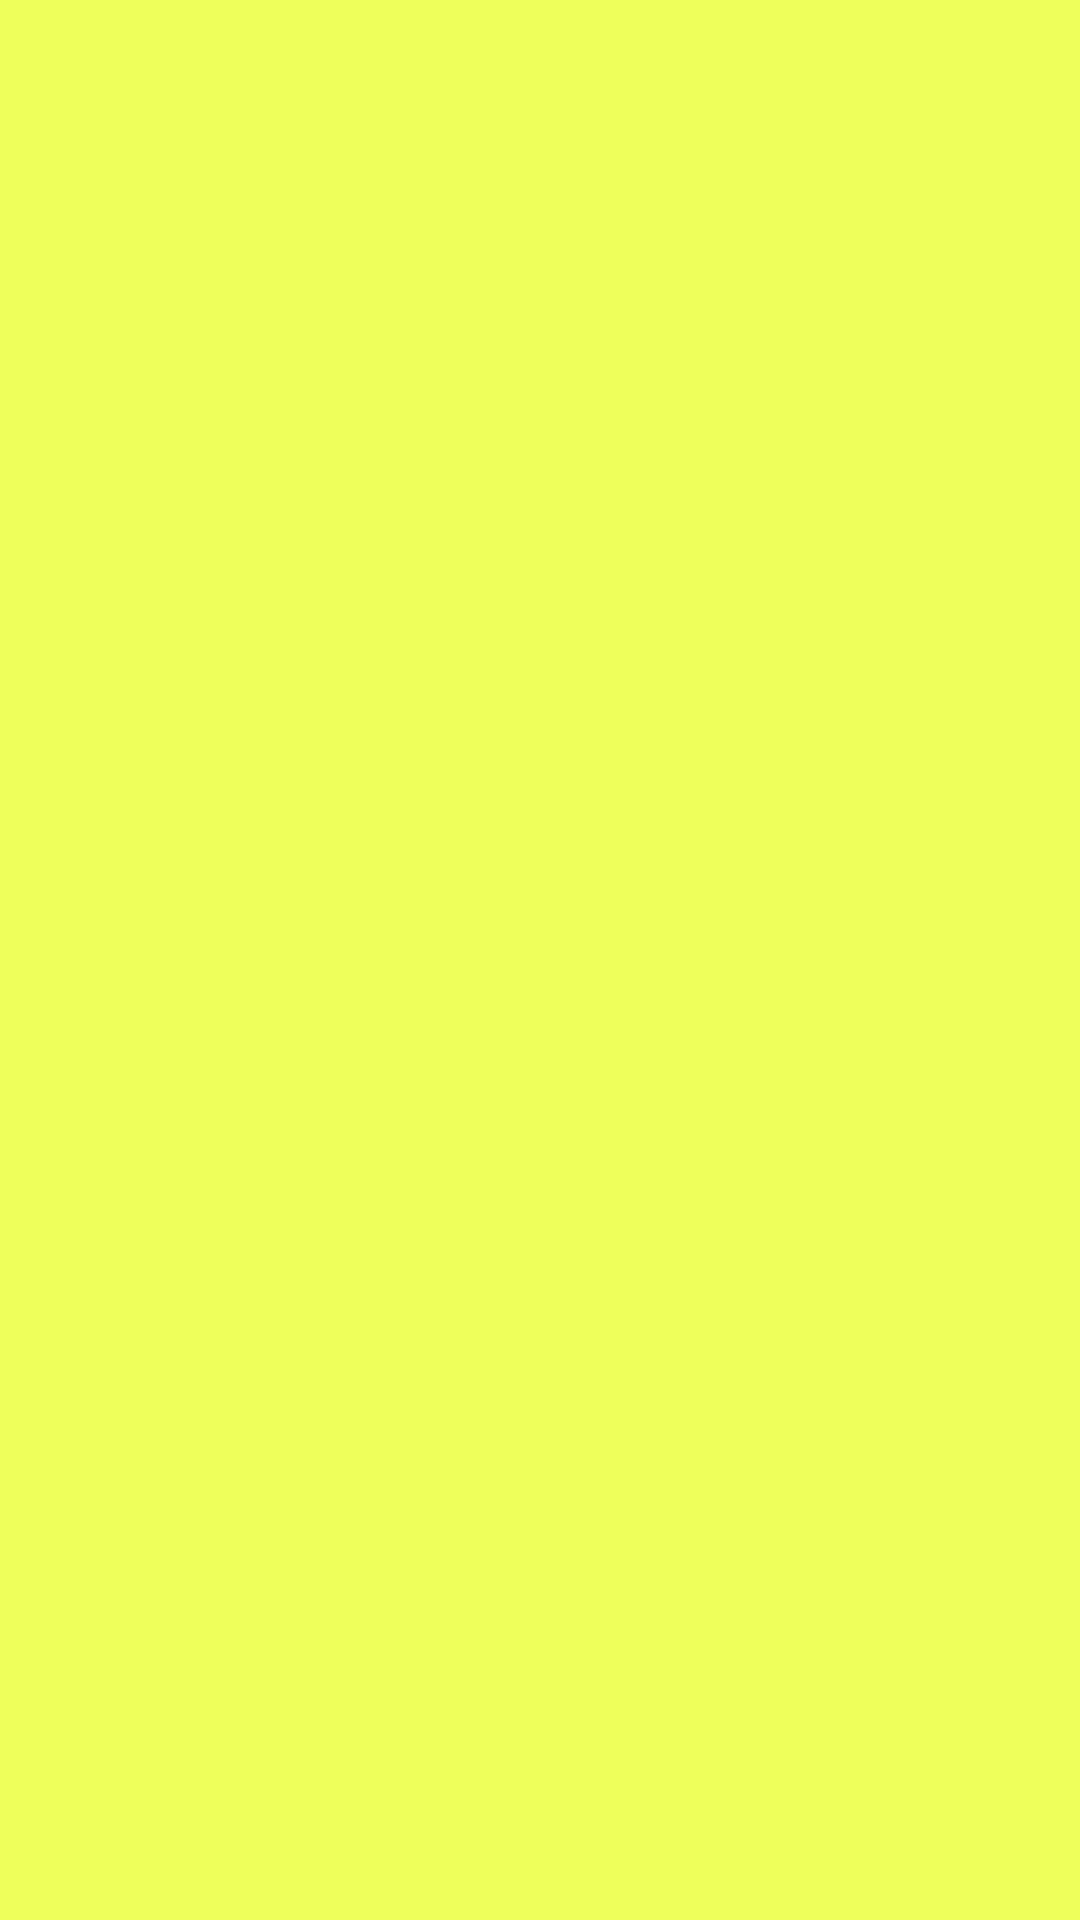 Res: 1080x1920, edff5a Solid color image https://www.solidcolore.com/edff5a.